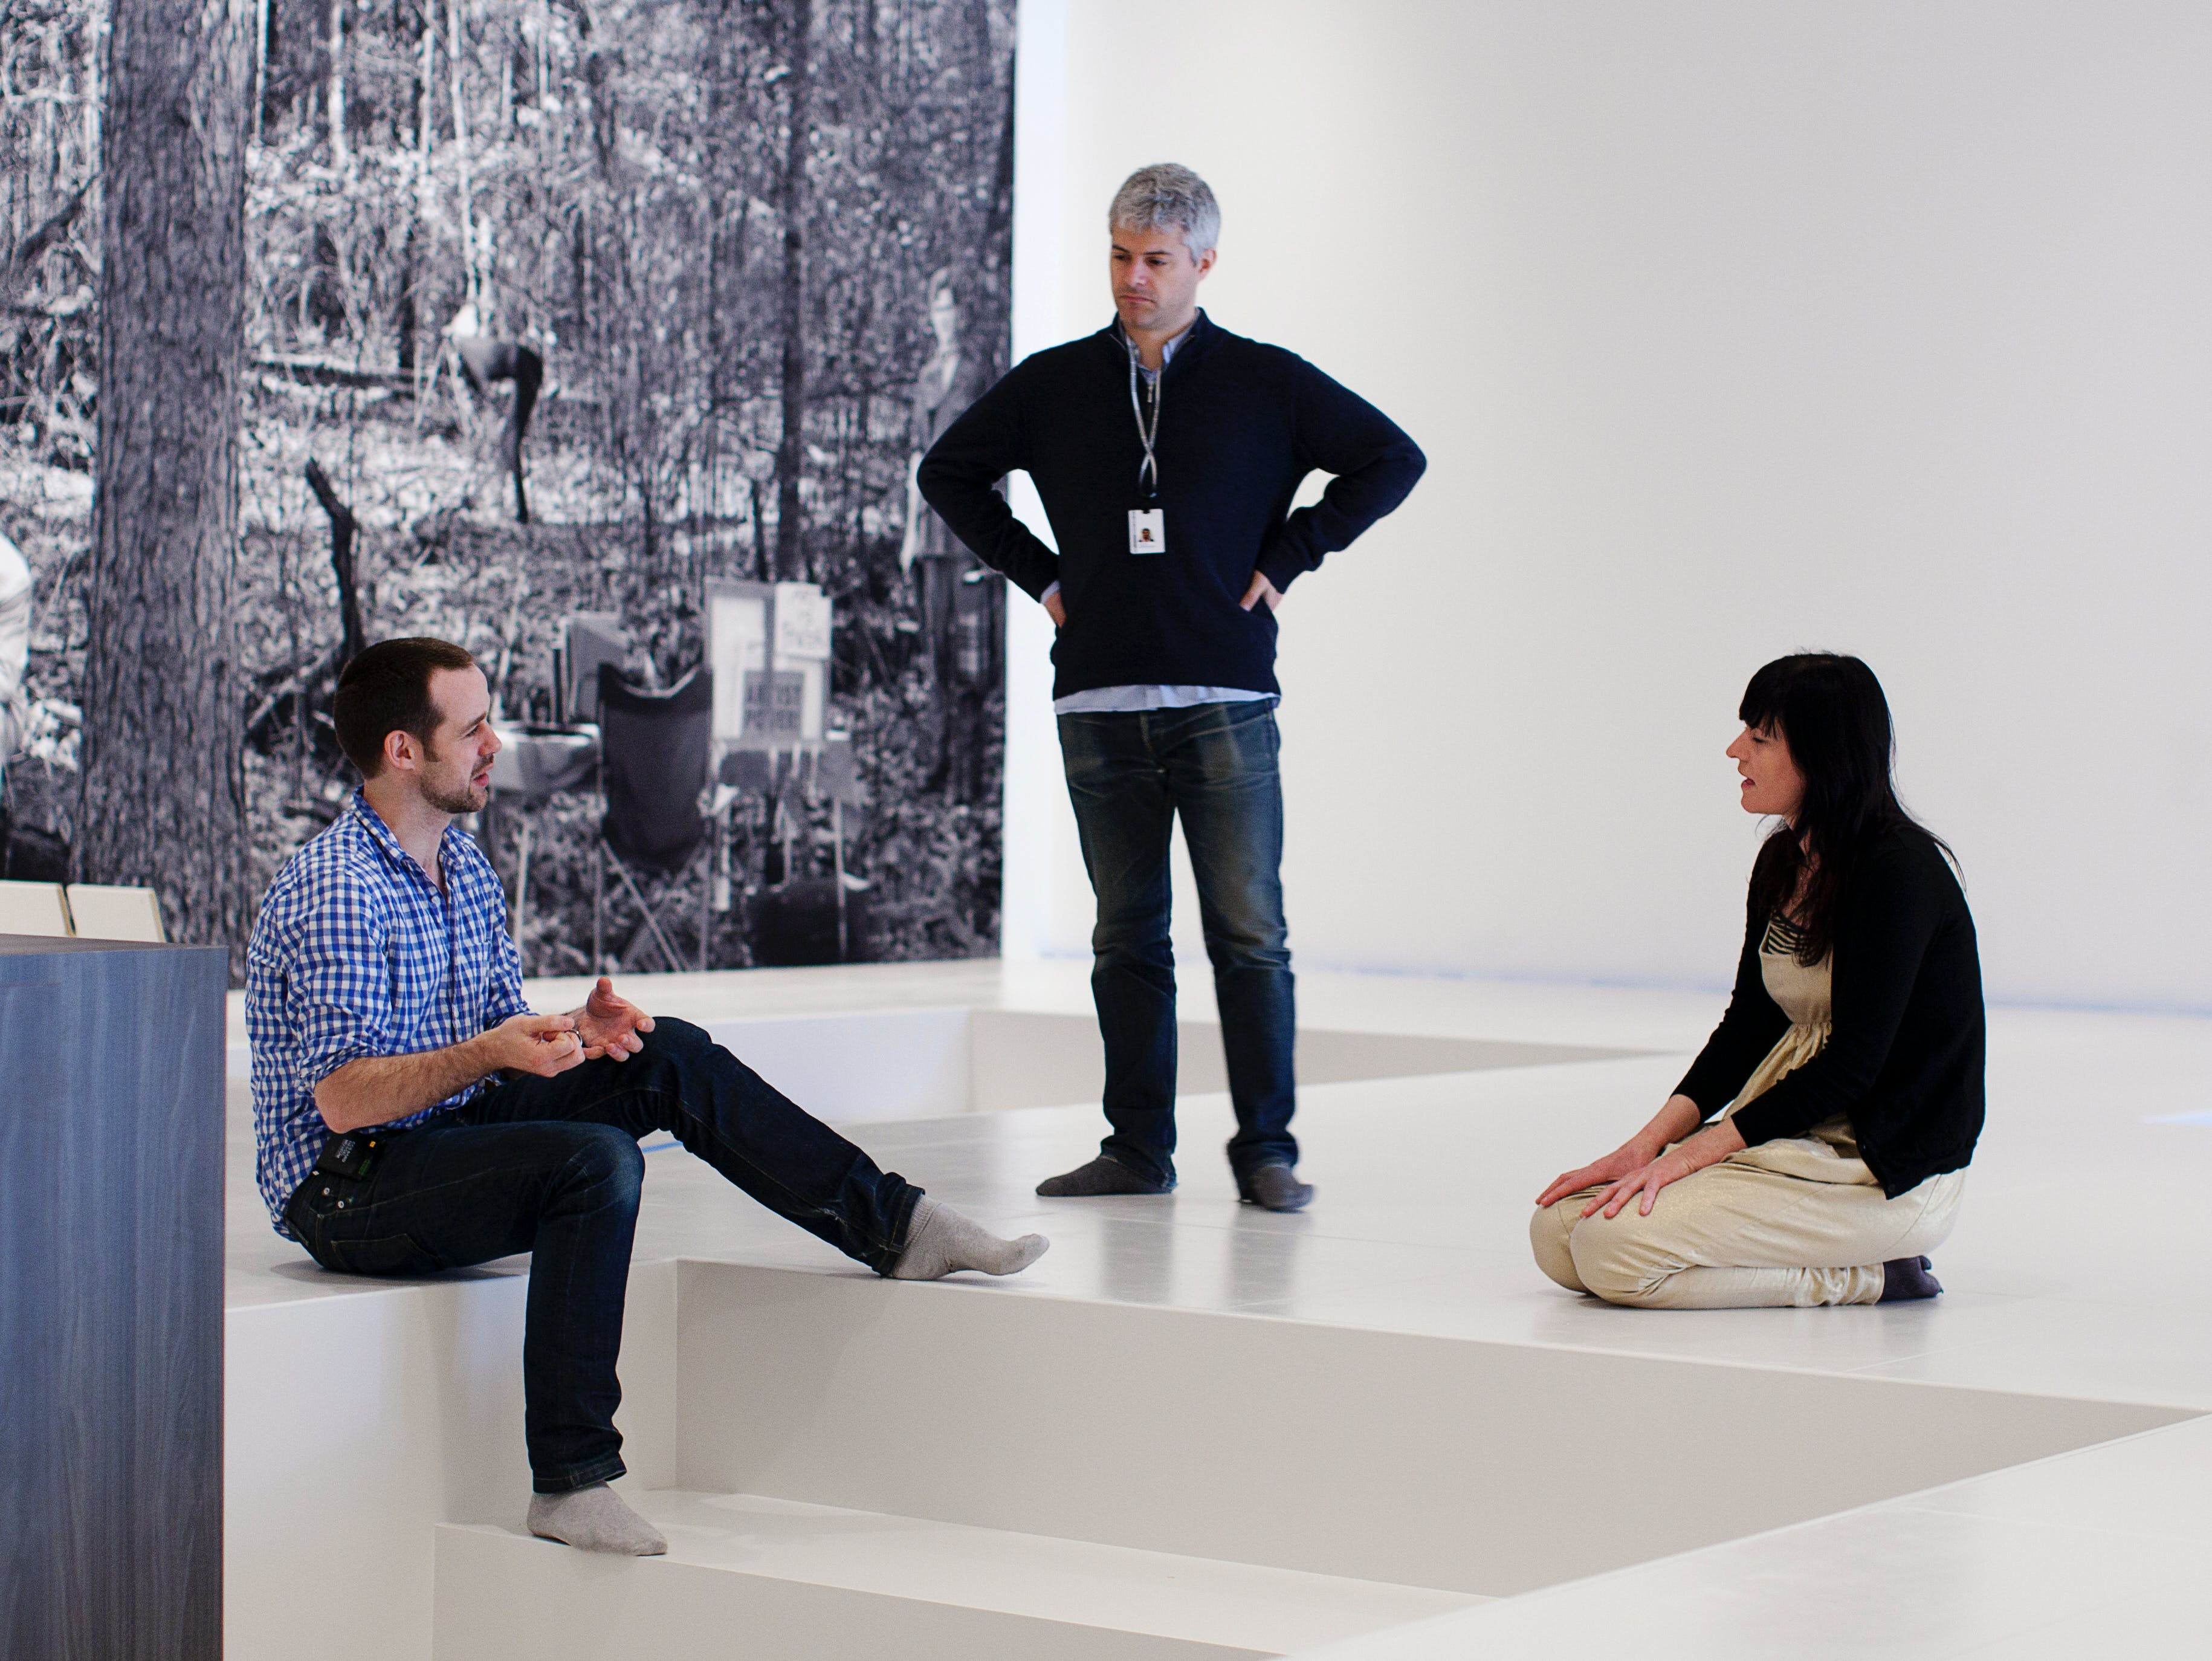 Goshka Macuga in Conversation with Peter Eleey and Bartholomew Ryan